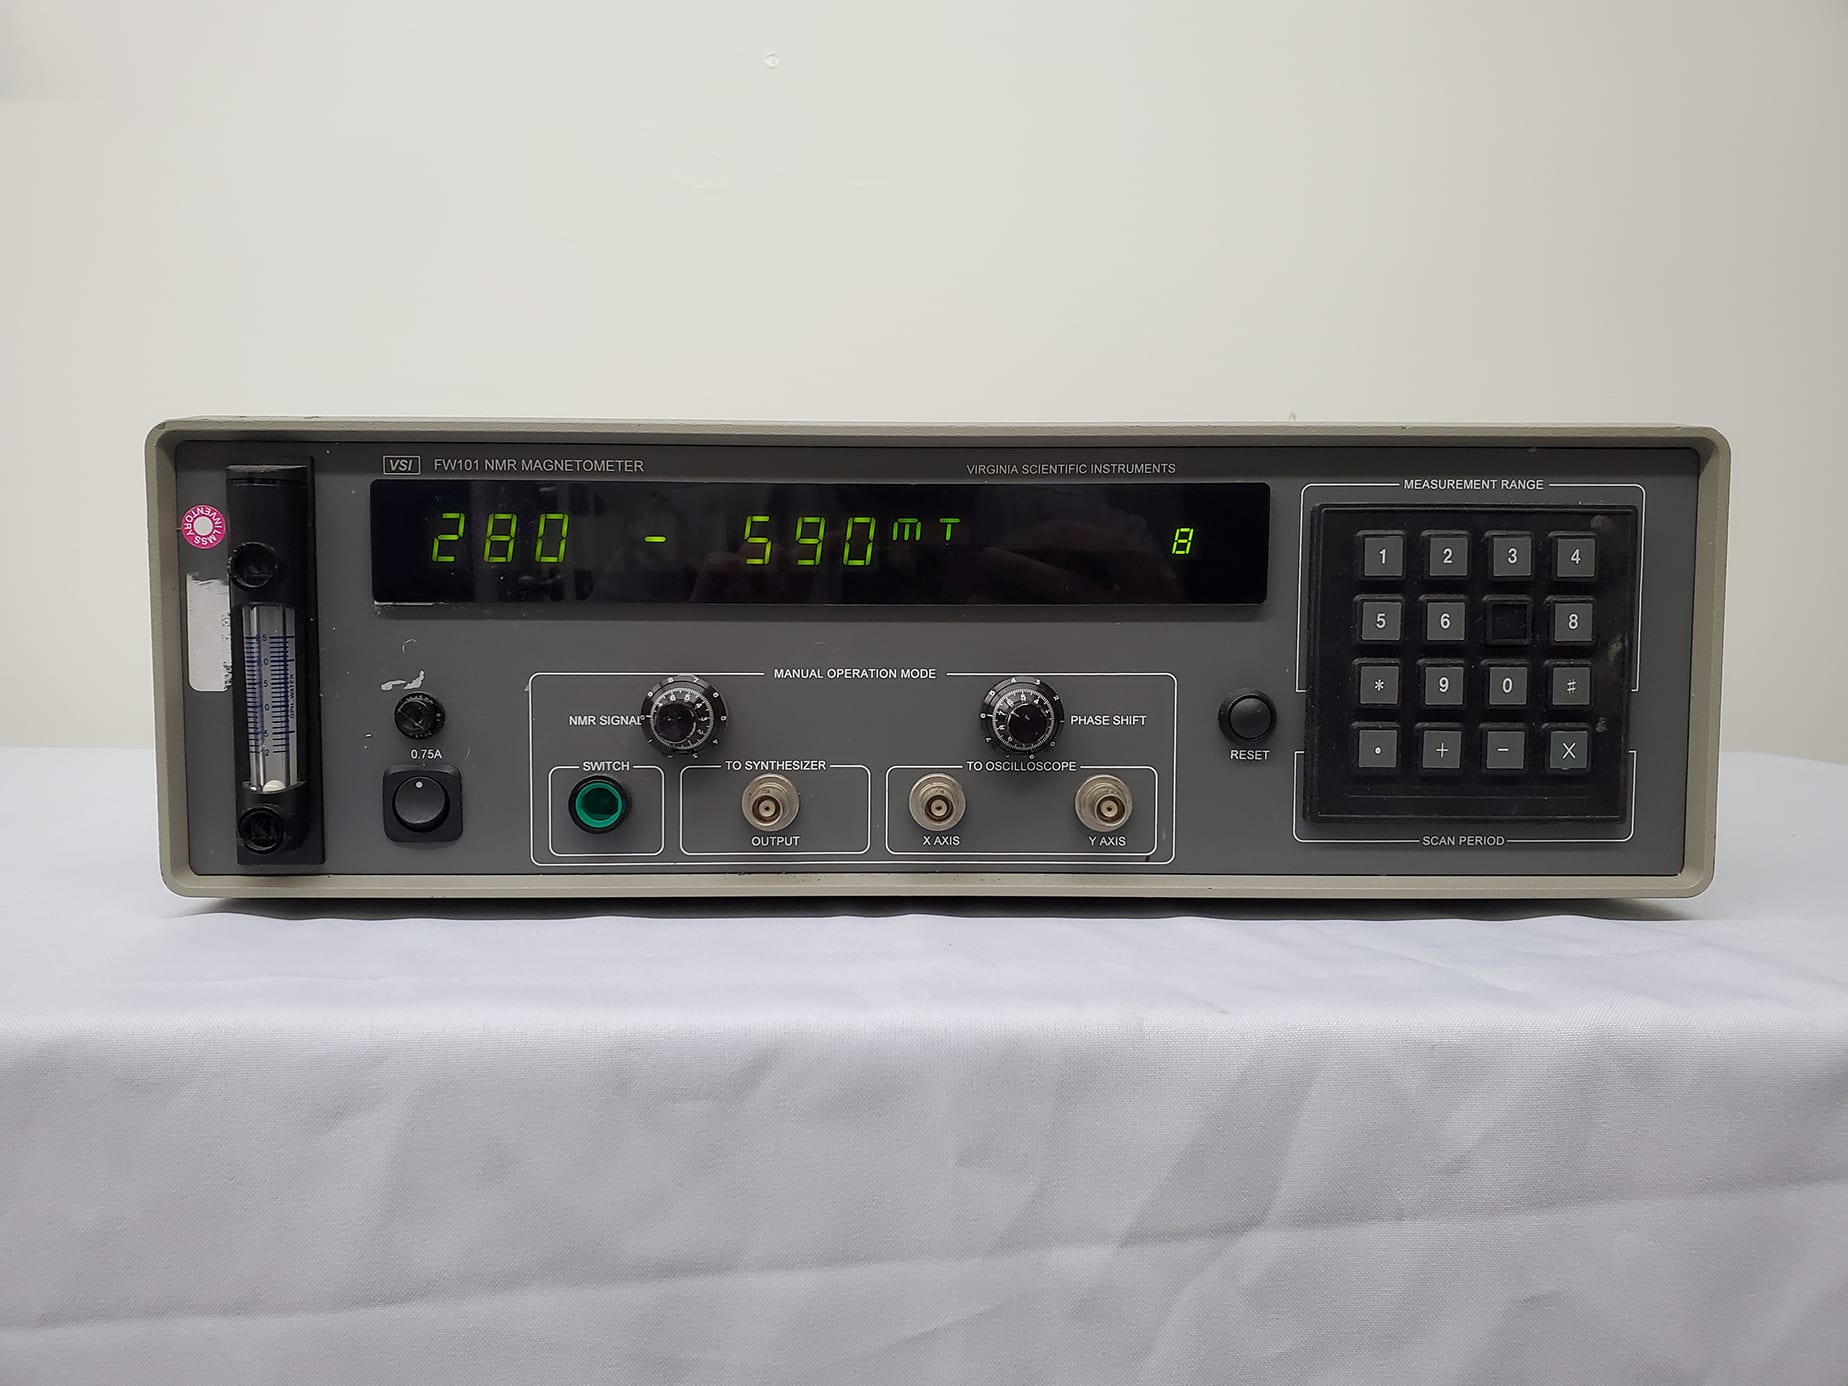 Buy Virgina Scientific Instruments (VSI)-FW 101-NMR Magnetometer-58850